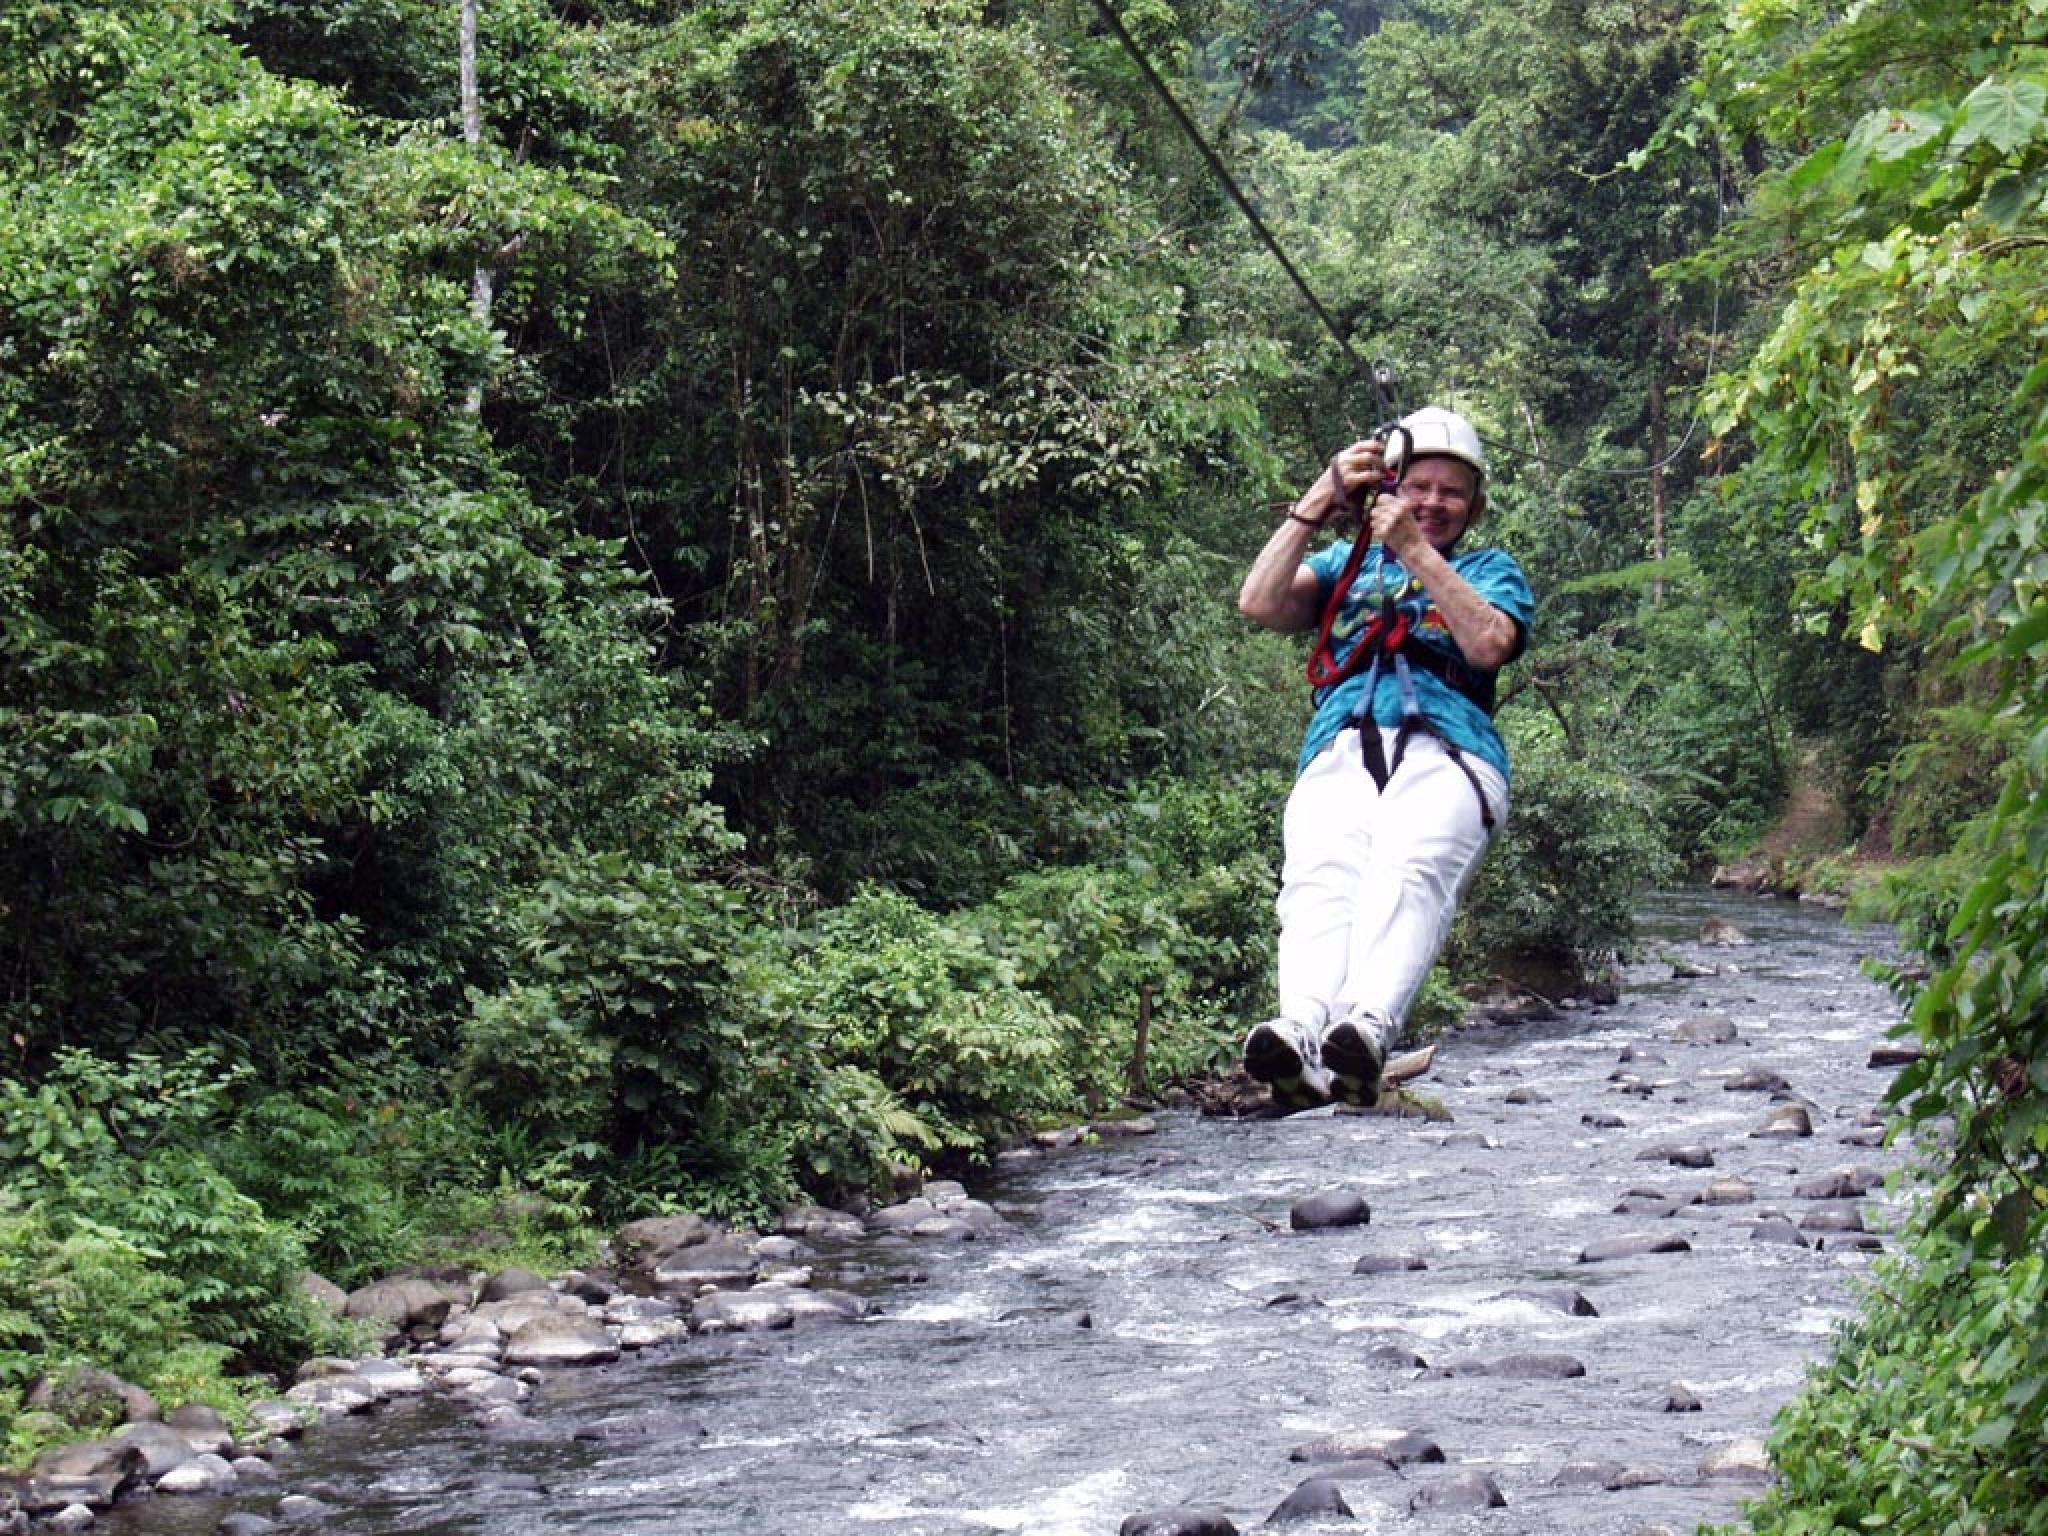 Arenal Canopy Tour & Arenal Canopy Tour - Paraiso Rain Forest Zip Line